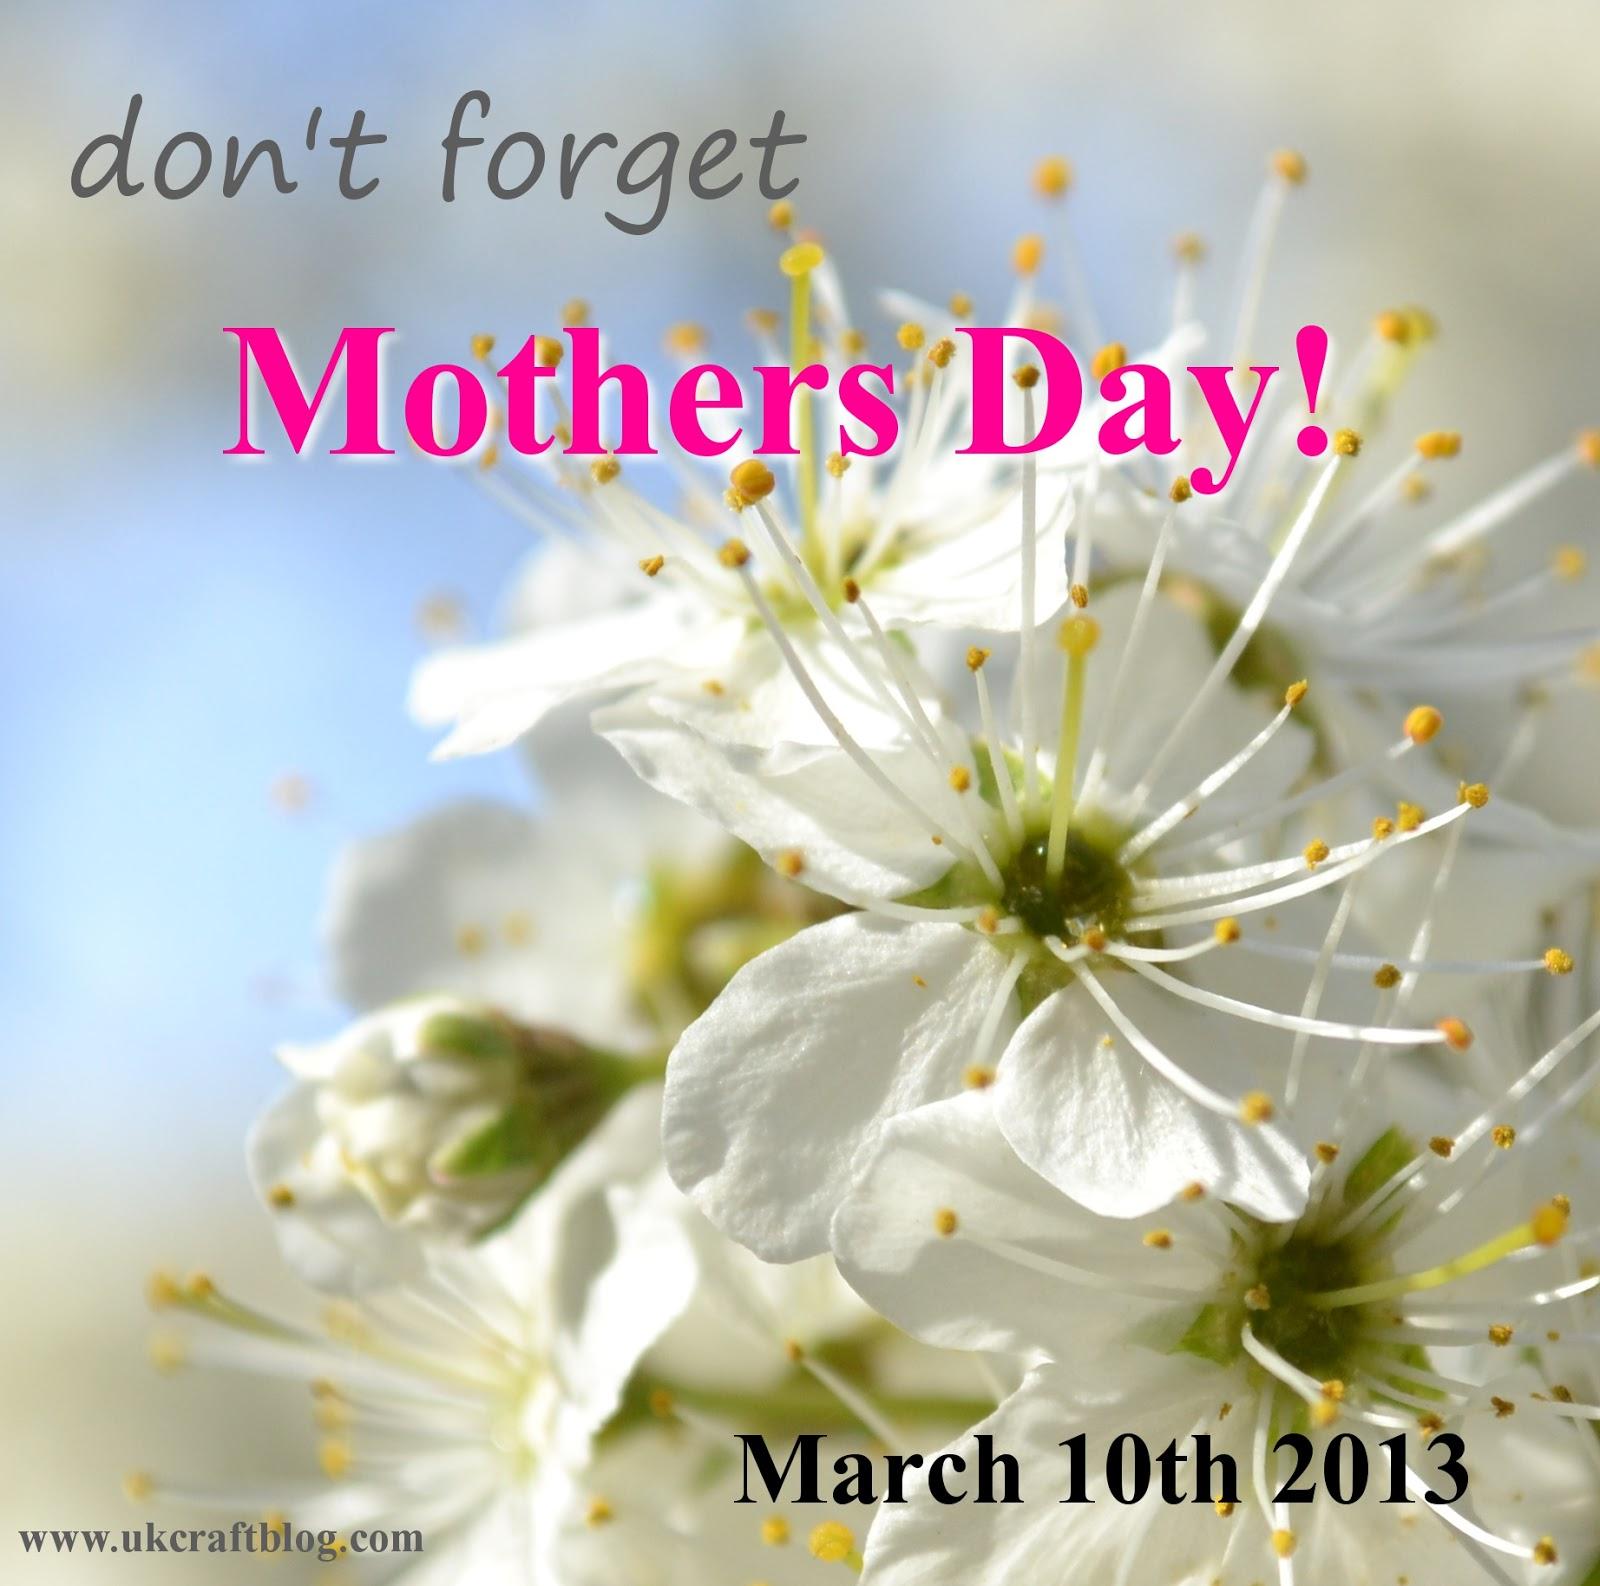 http://1.bp.blogspot.com/-GftuVOZMWRQ/USoYFKsSpbI/AAAAAAAAHQ0/0sU_mCVVIQ8/s1600/MothersDay.JPG